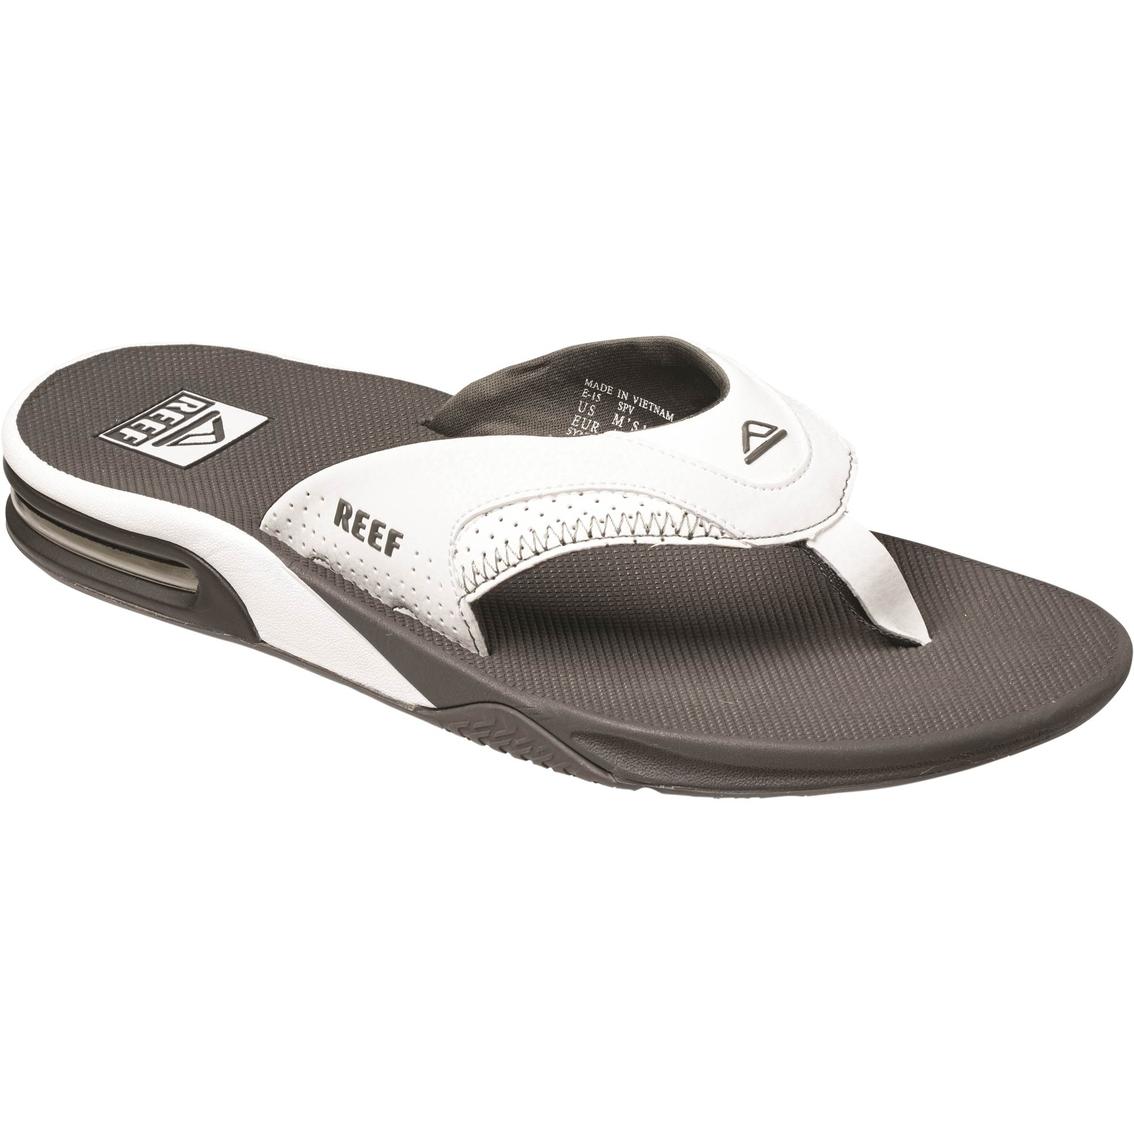 122c14ba50e Reef Men s Fanning Sandals